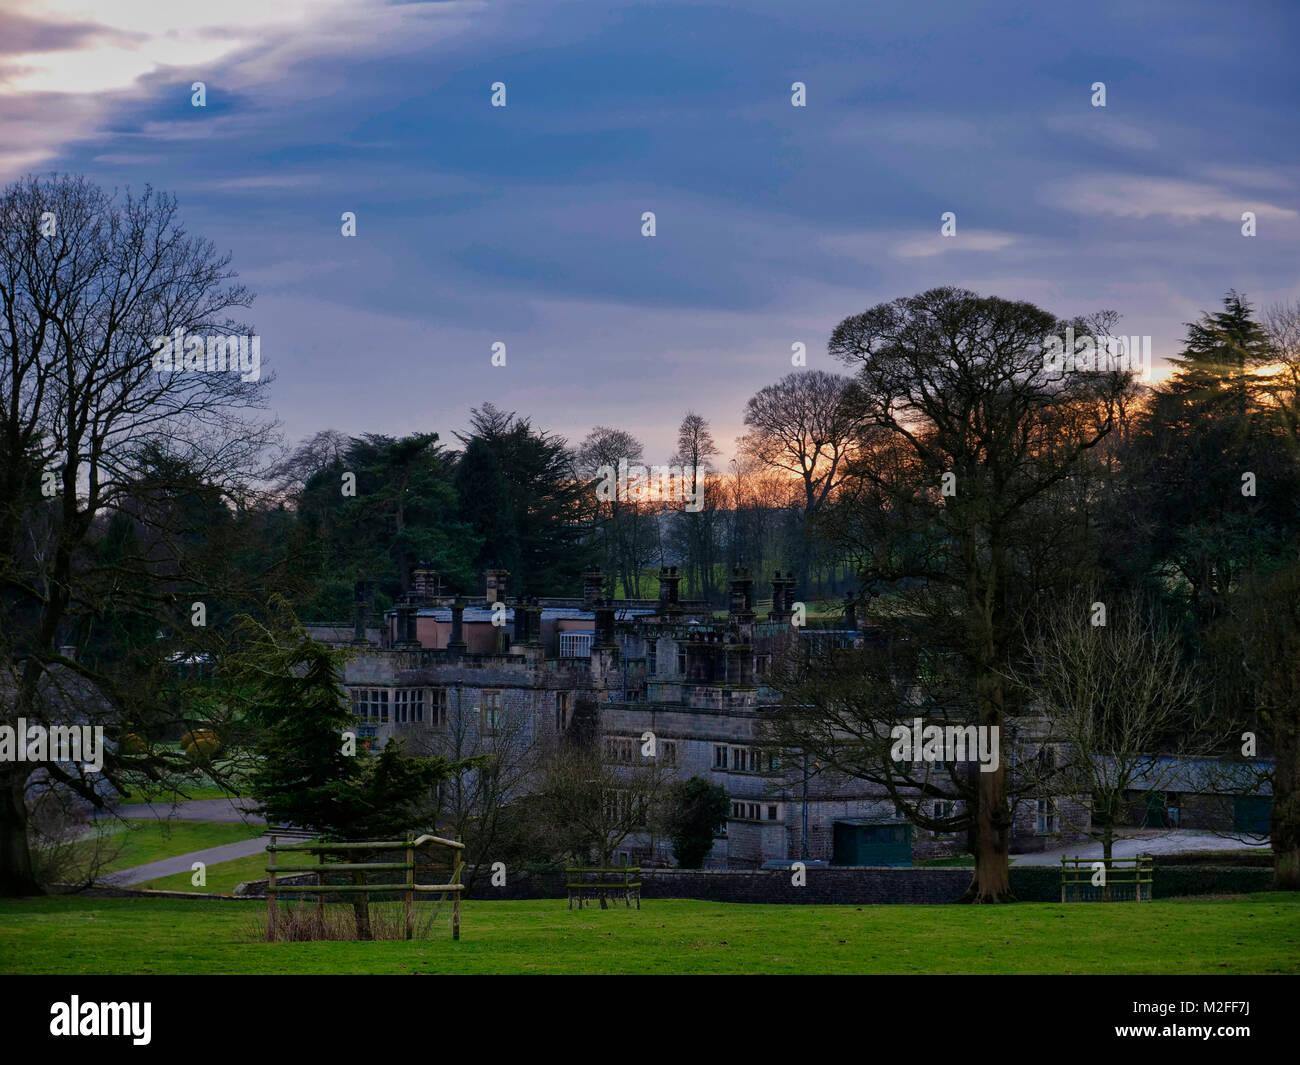 Peak District National Park, Derbyshire. 7th Feb, 2018. UK Weather: Wonderful sunset over Tissington Hall in Tissington Village in the Peak District National Park, Derbyshire, England, UK Credit: Doug Blane/Alamy Live News Stock Photo